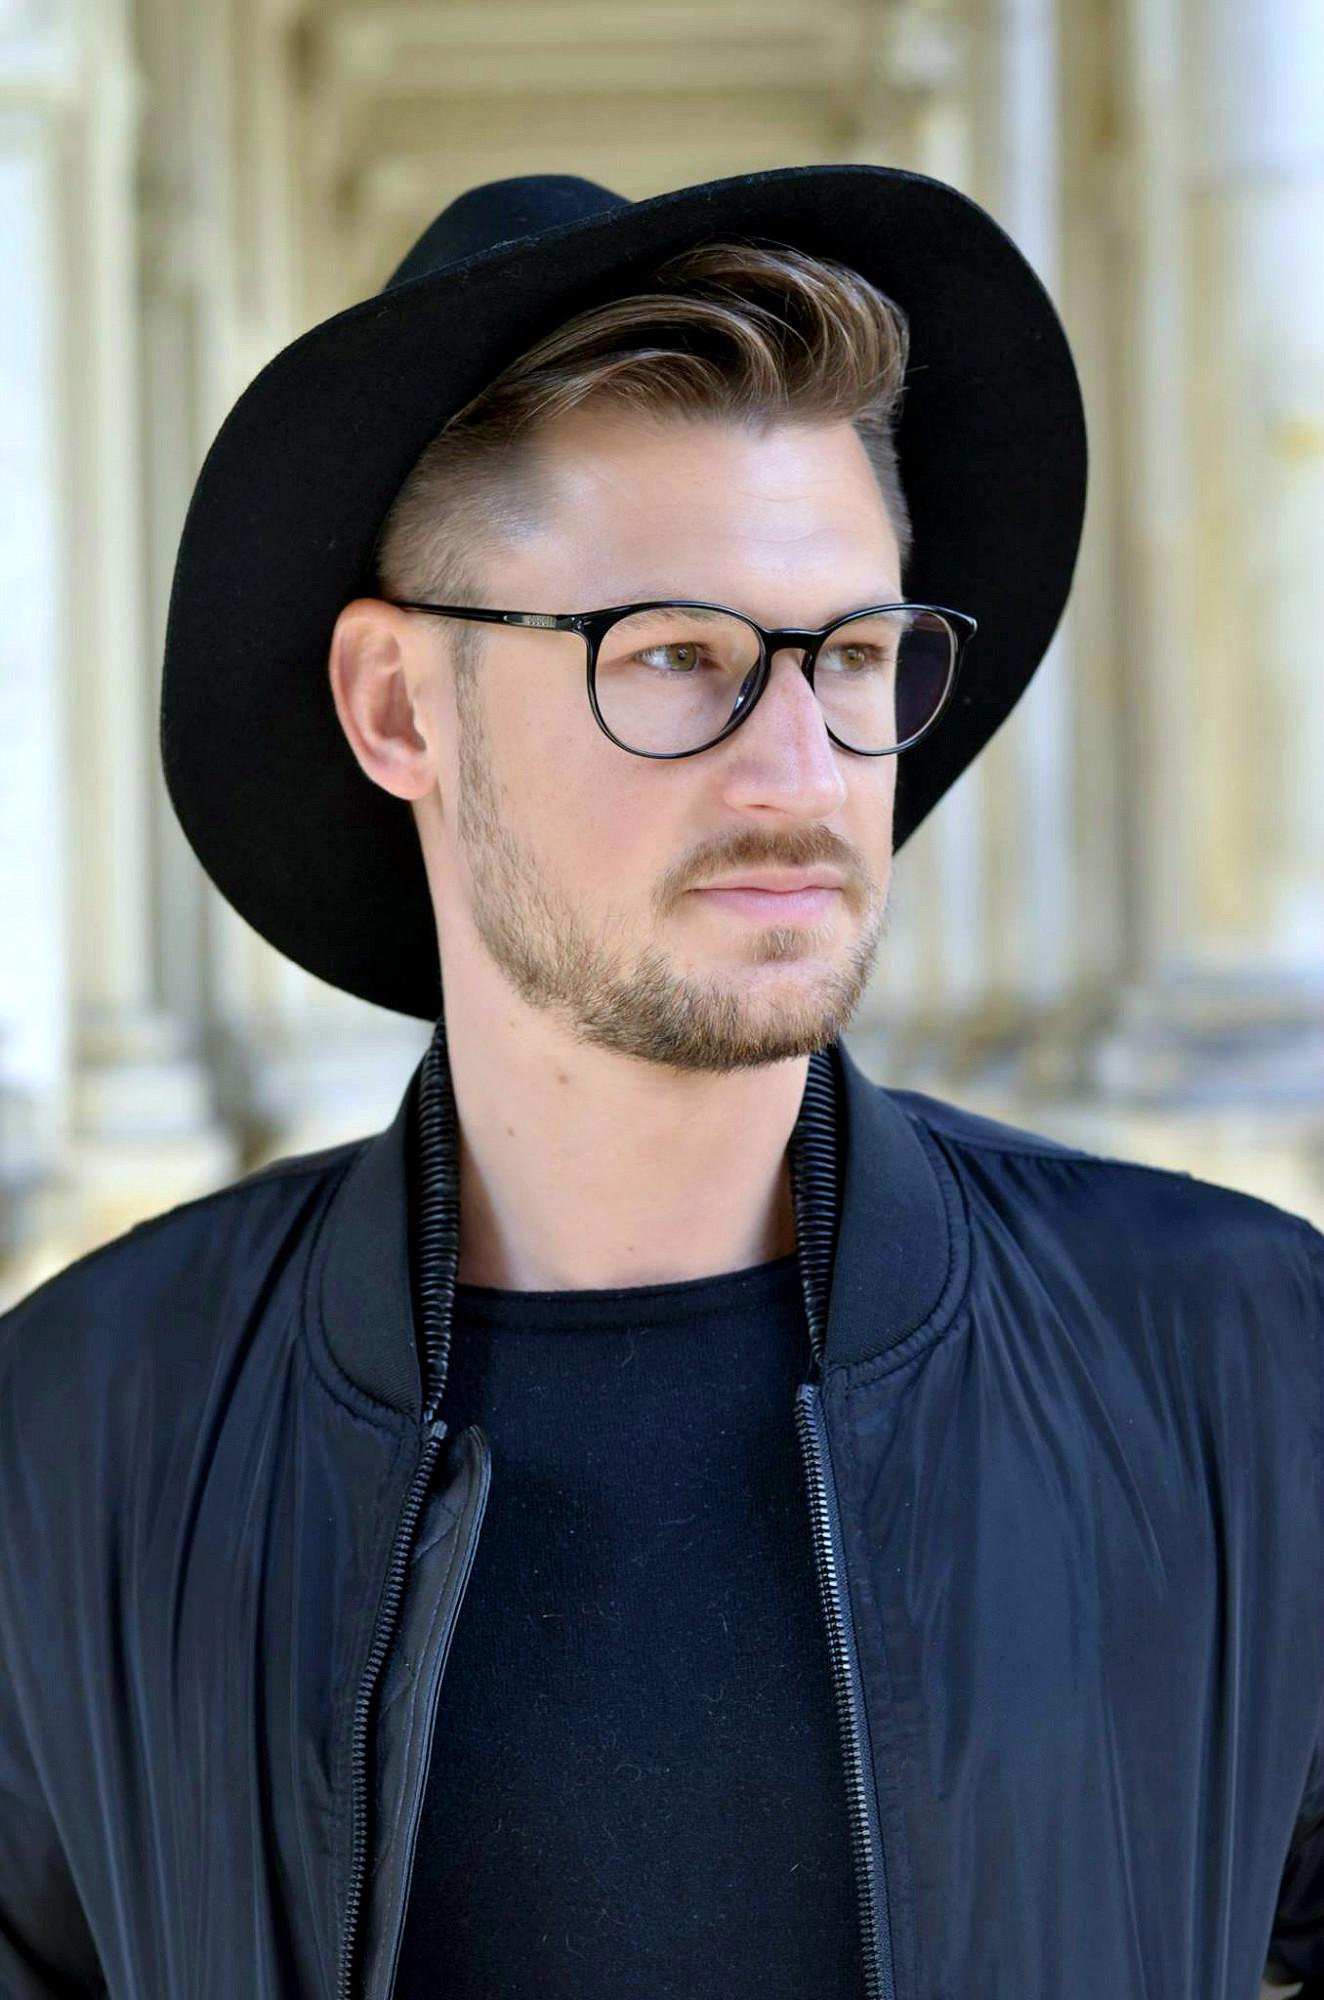 Männer-Mode-Blog-Berlin-Outfit-Chelsea-Boots-Fedora-Hat-Black